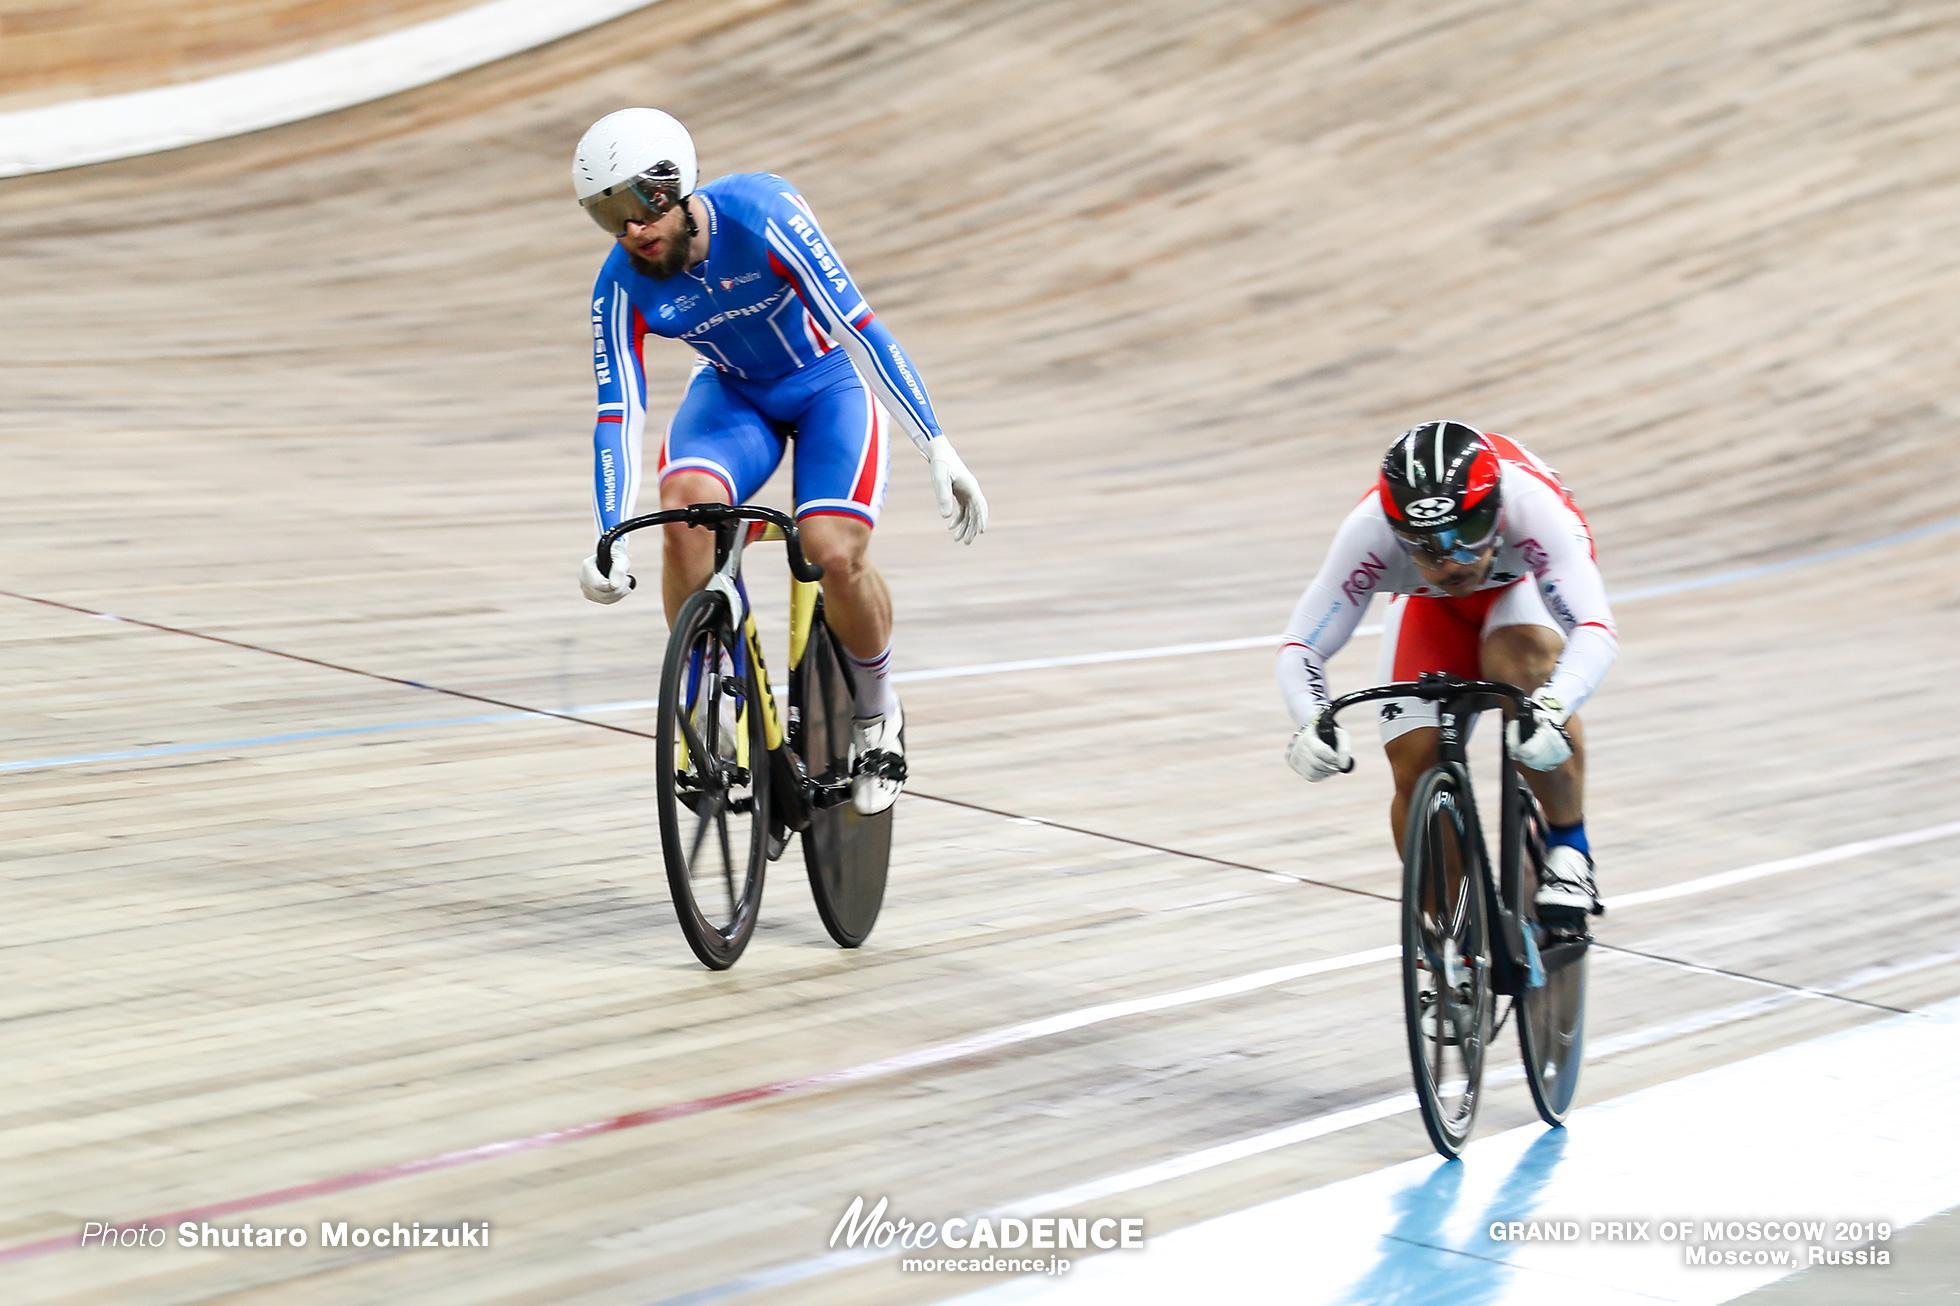 1/16 Finals / Men's Sprint / GRAND PRIX OF MOSCOW 2019